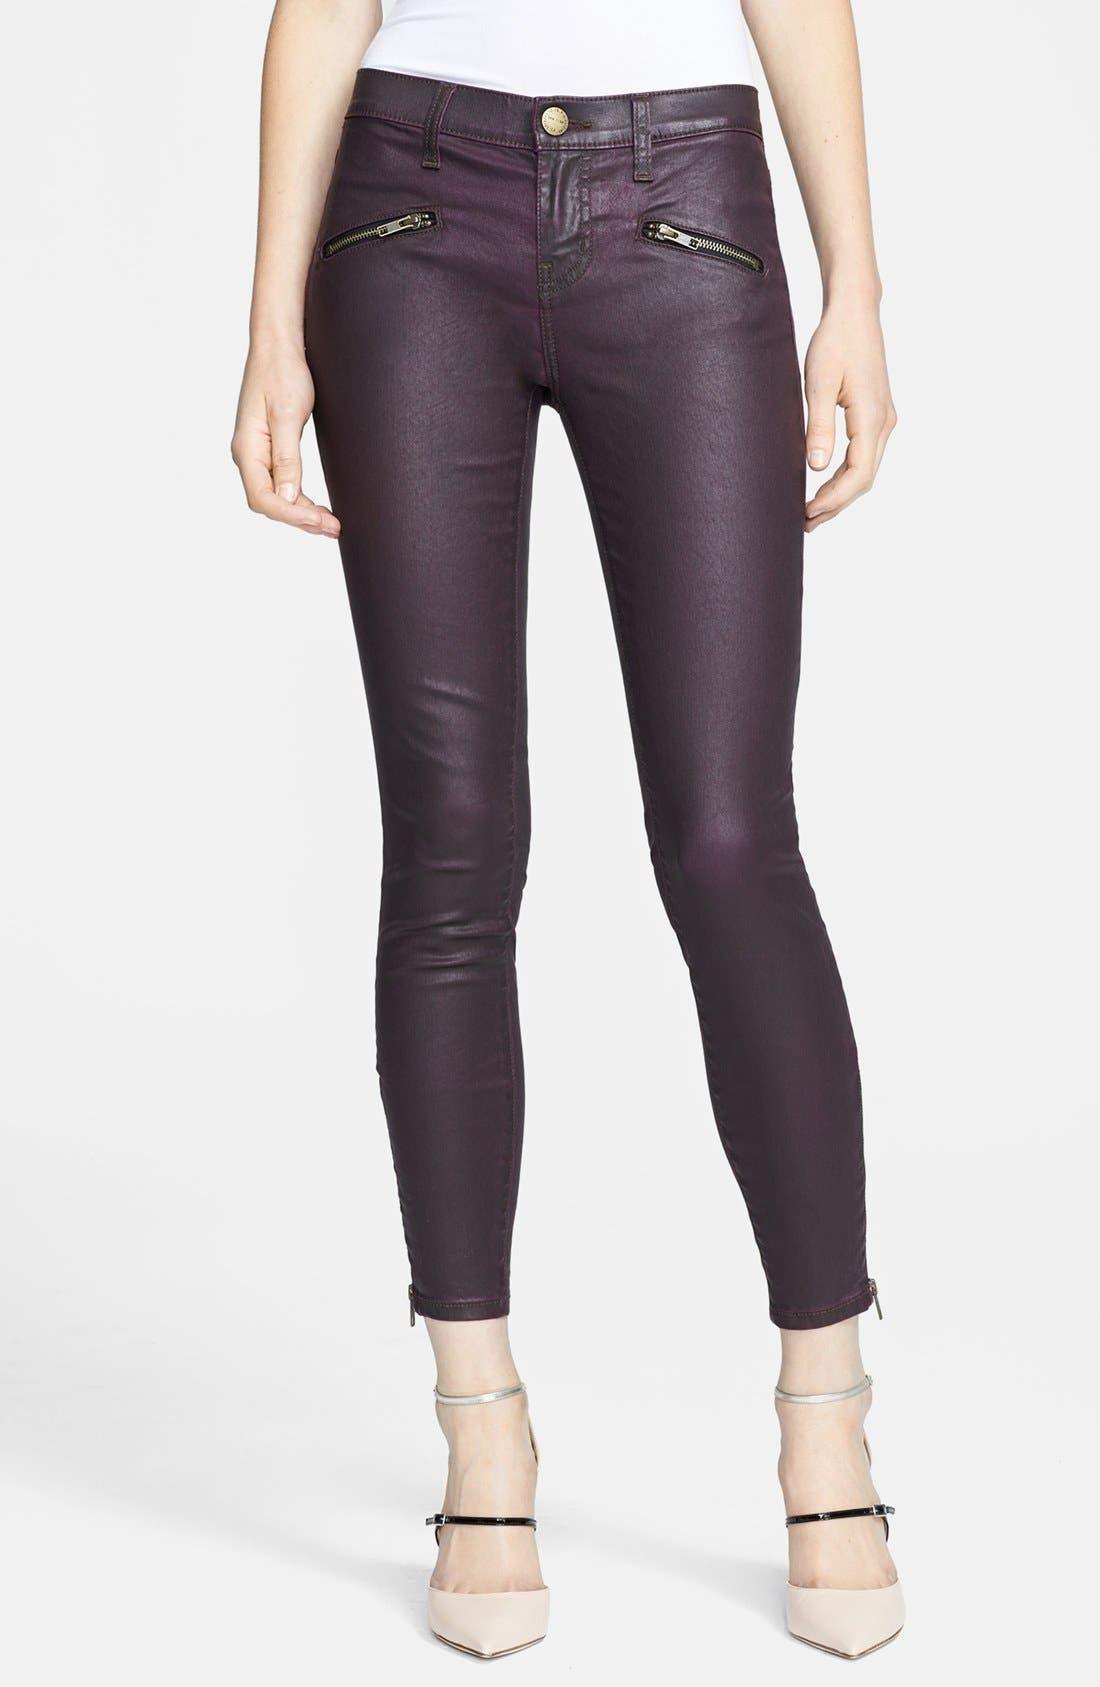 Alternate Image 1 Selected - Current/Elliott 'The Soho Zip' Skinny Coated Jeans